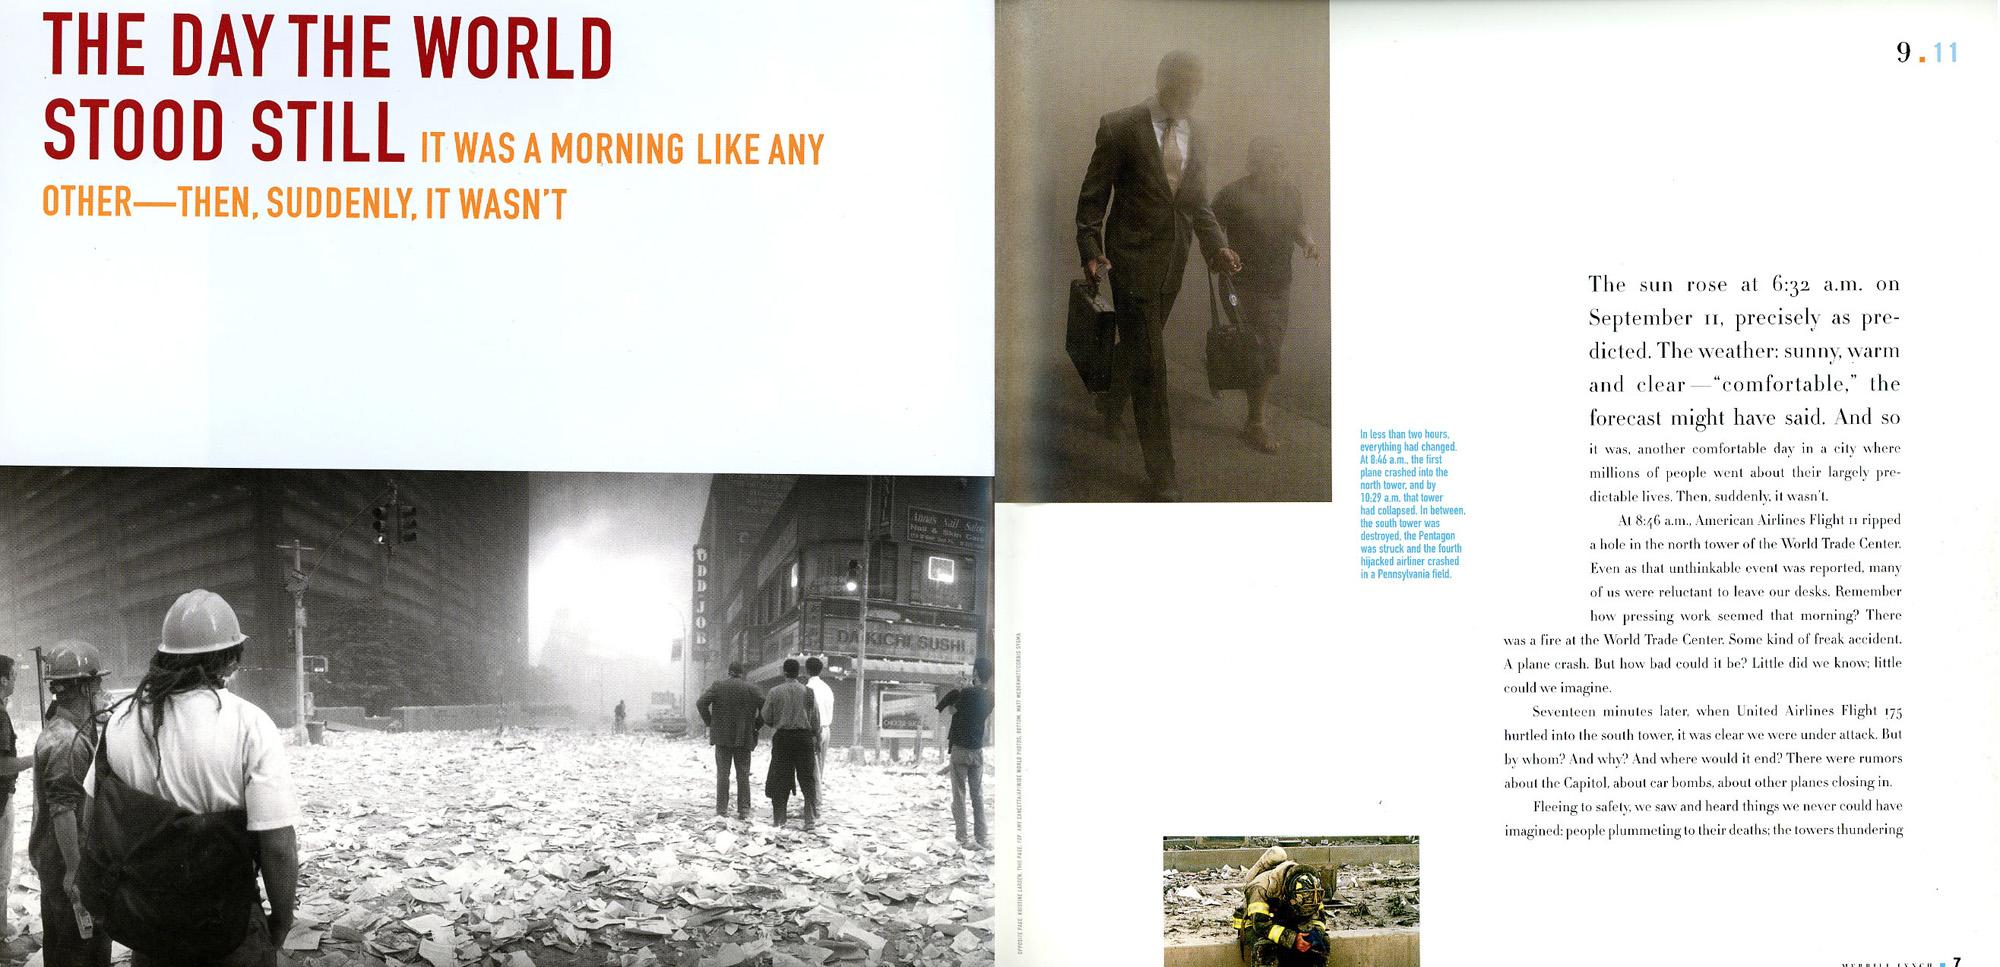 Client: Time Inc Custom PublishingProject: 9-11 Memorial Issue - Merrill Lynch Photo Researcher: Paula Gillen